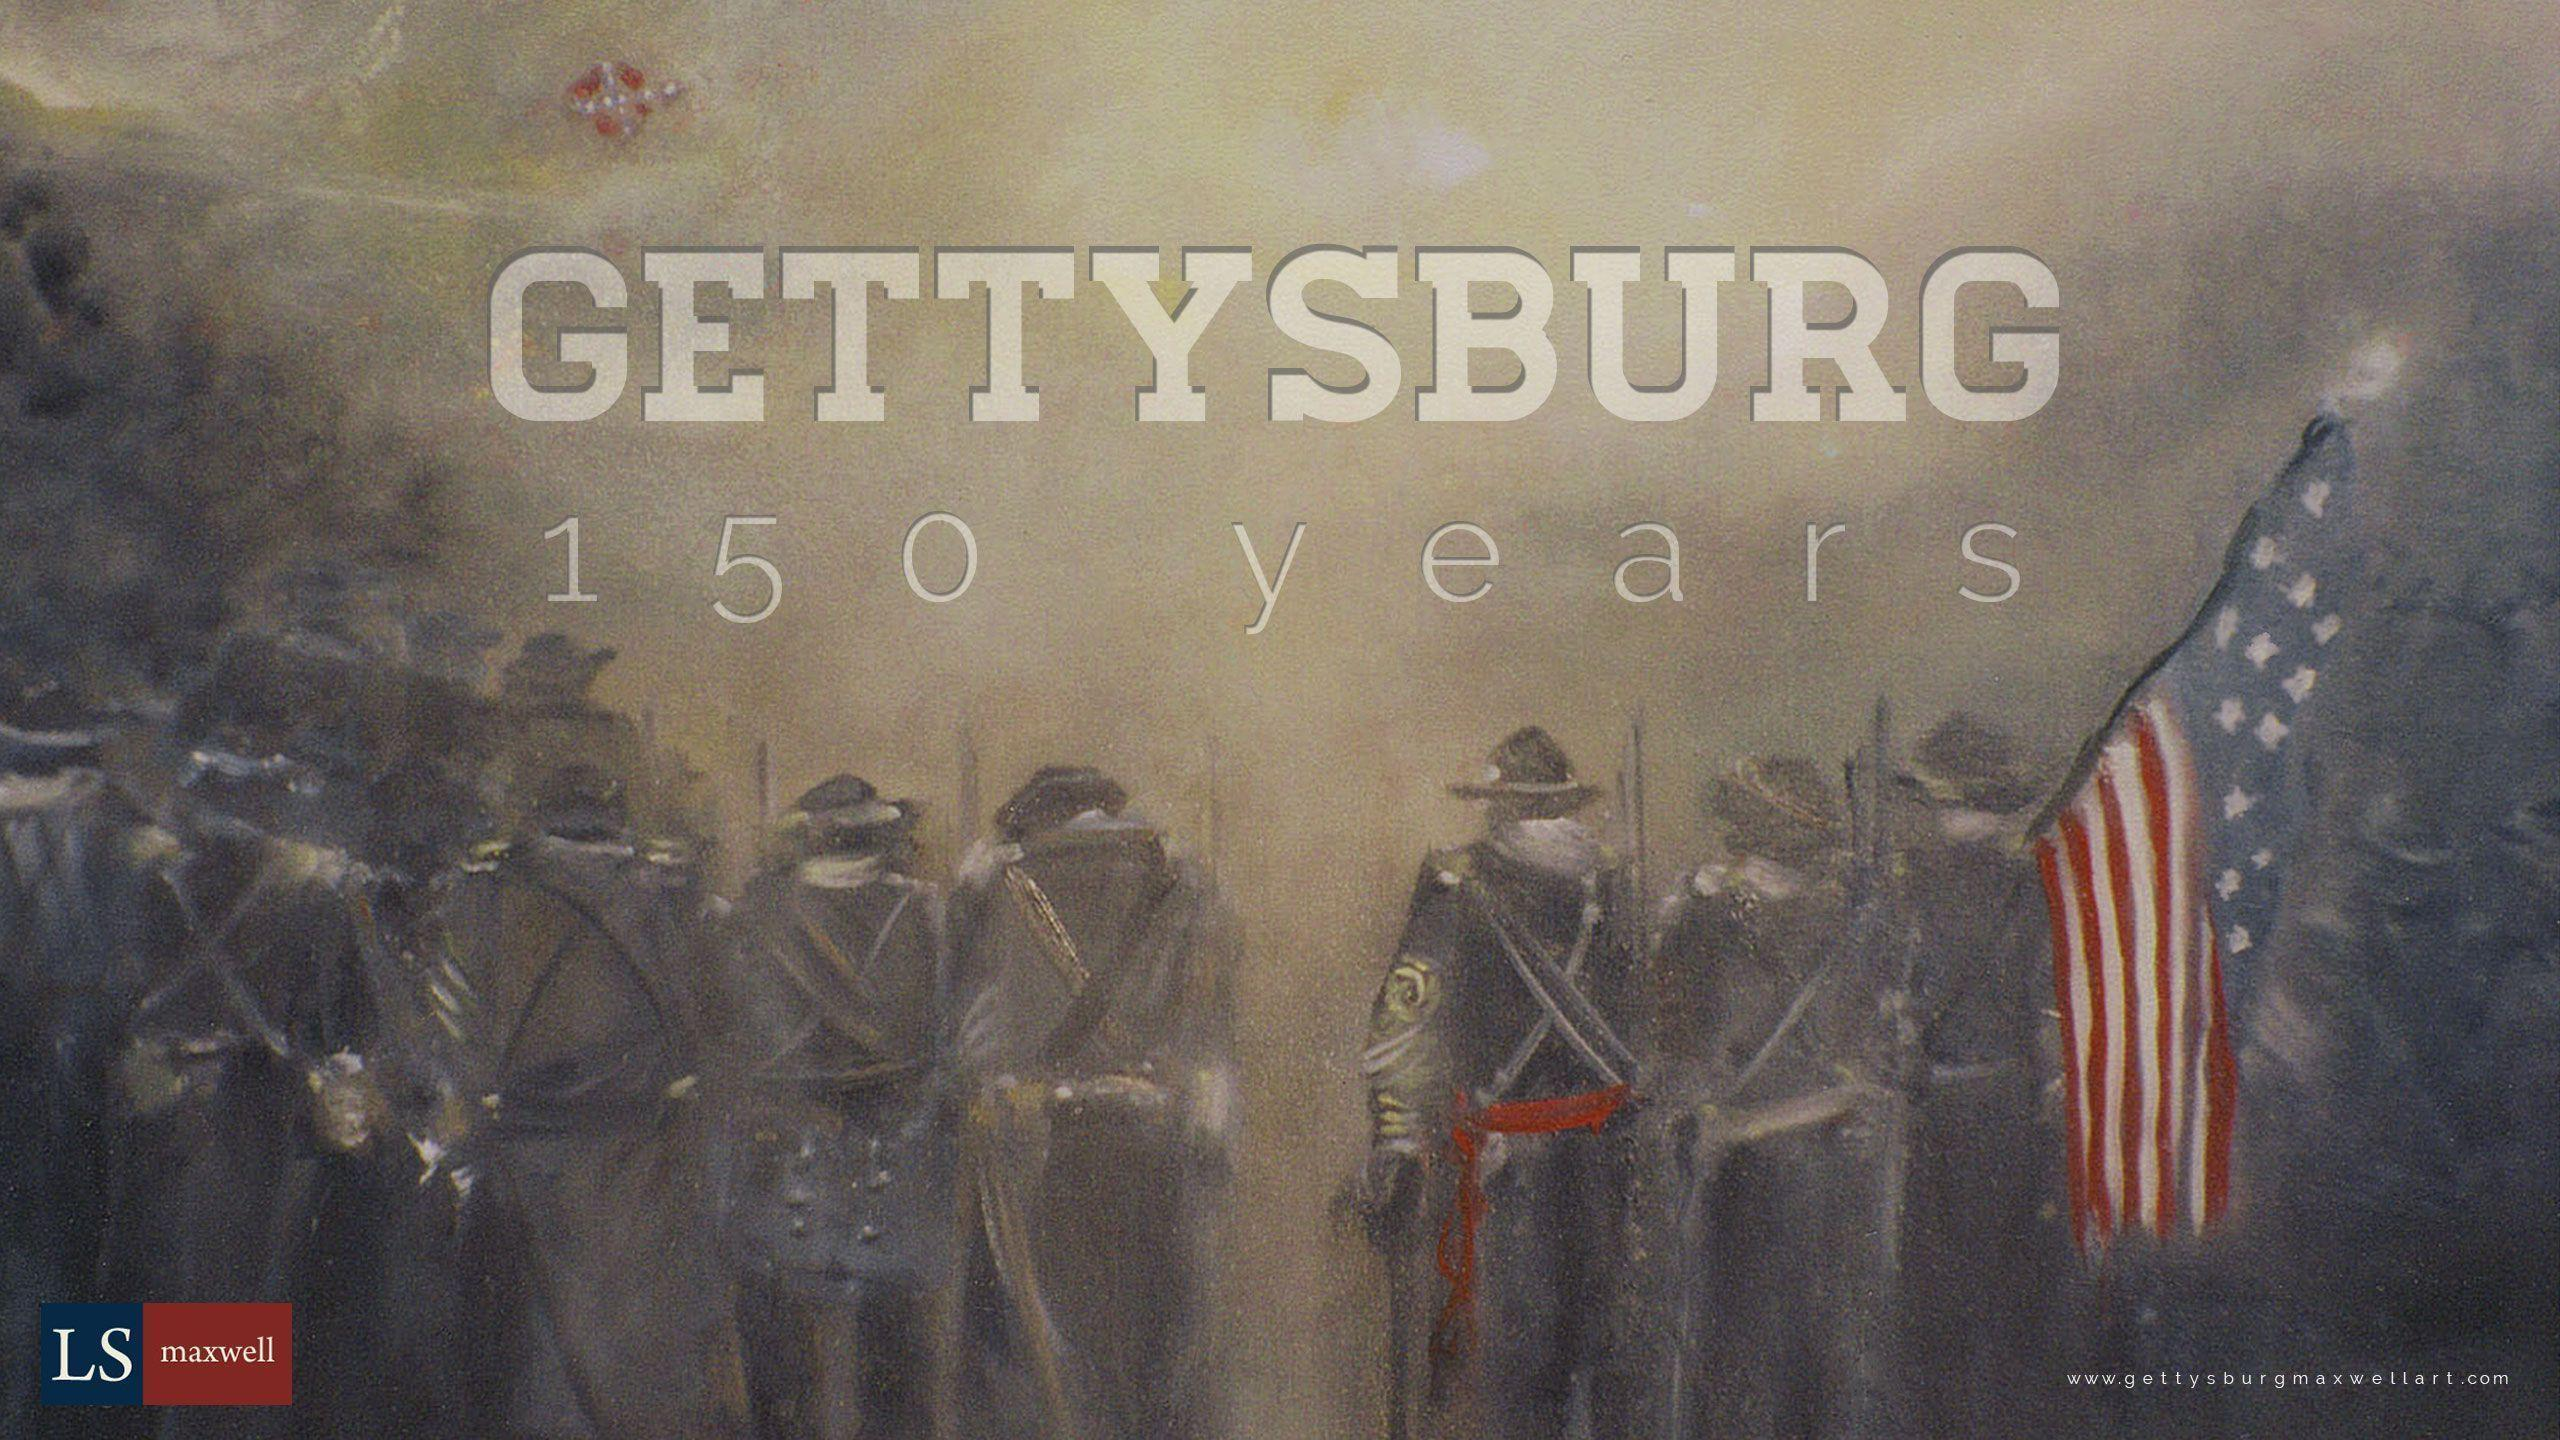 21 9 Pubg Wallpaper Gettysburg Wallpapers Wallpaper Cave